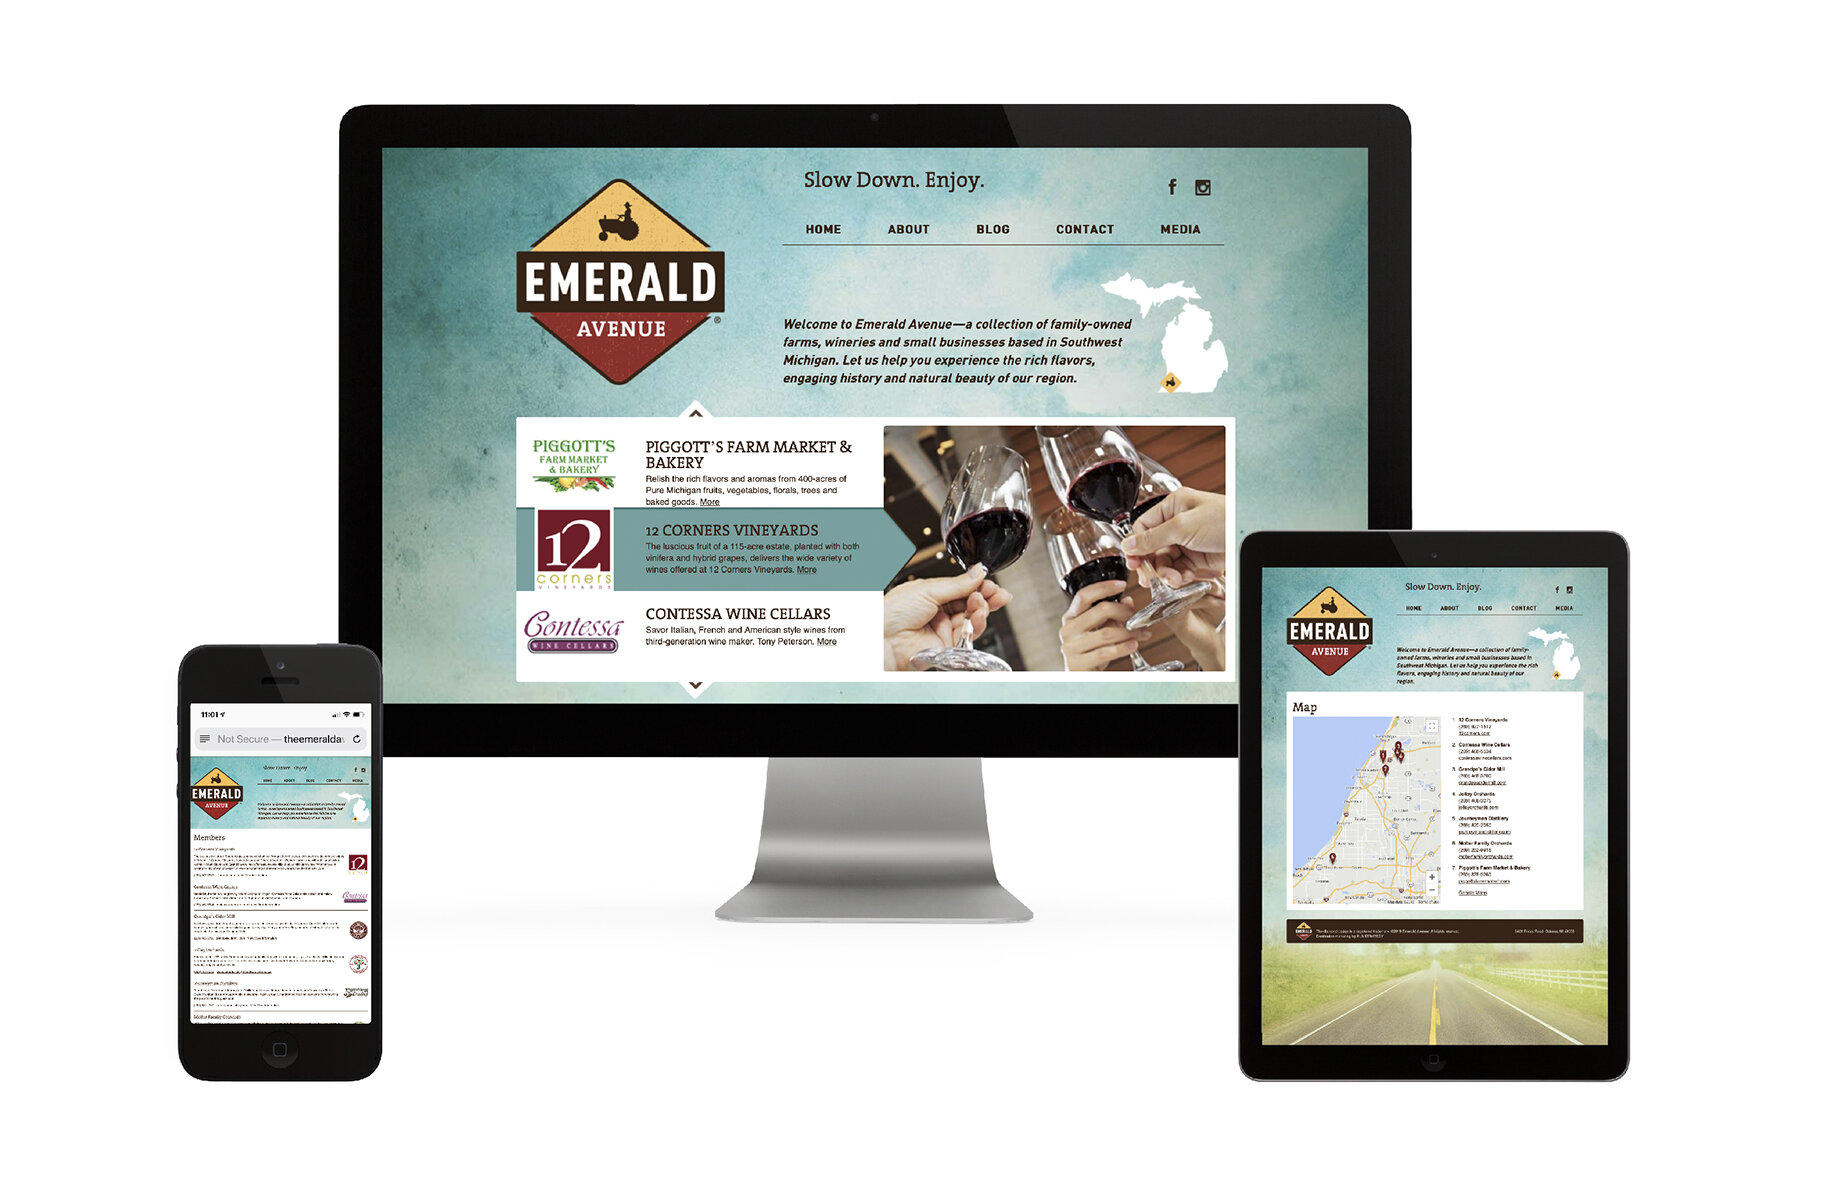 emerald ave digital.jpg